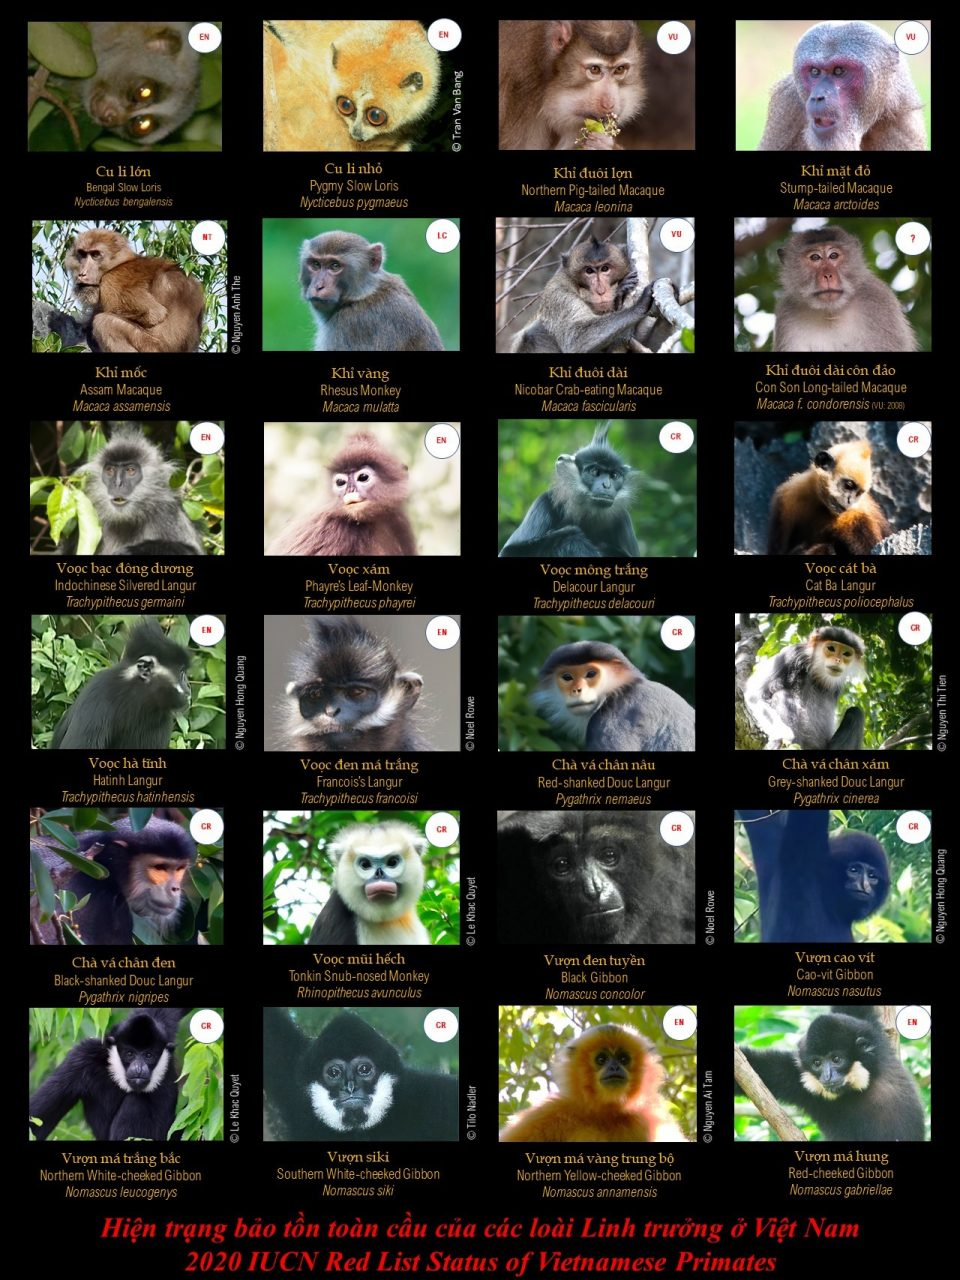 25 primates species in Vietnam – by Prof Hoang Minh Duc